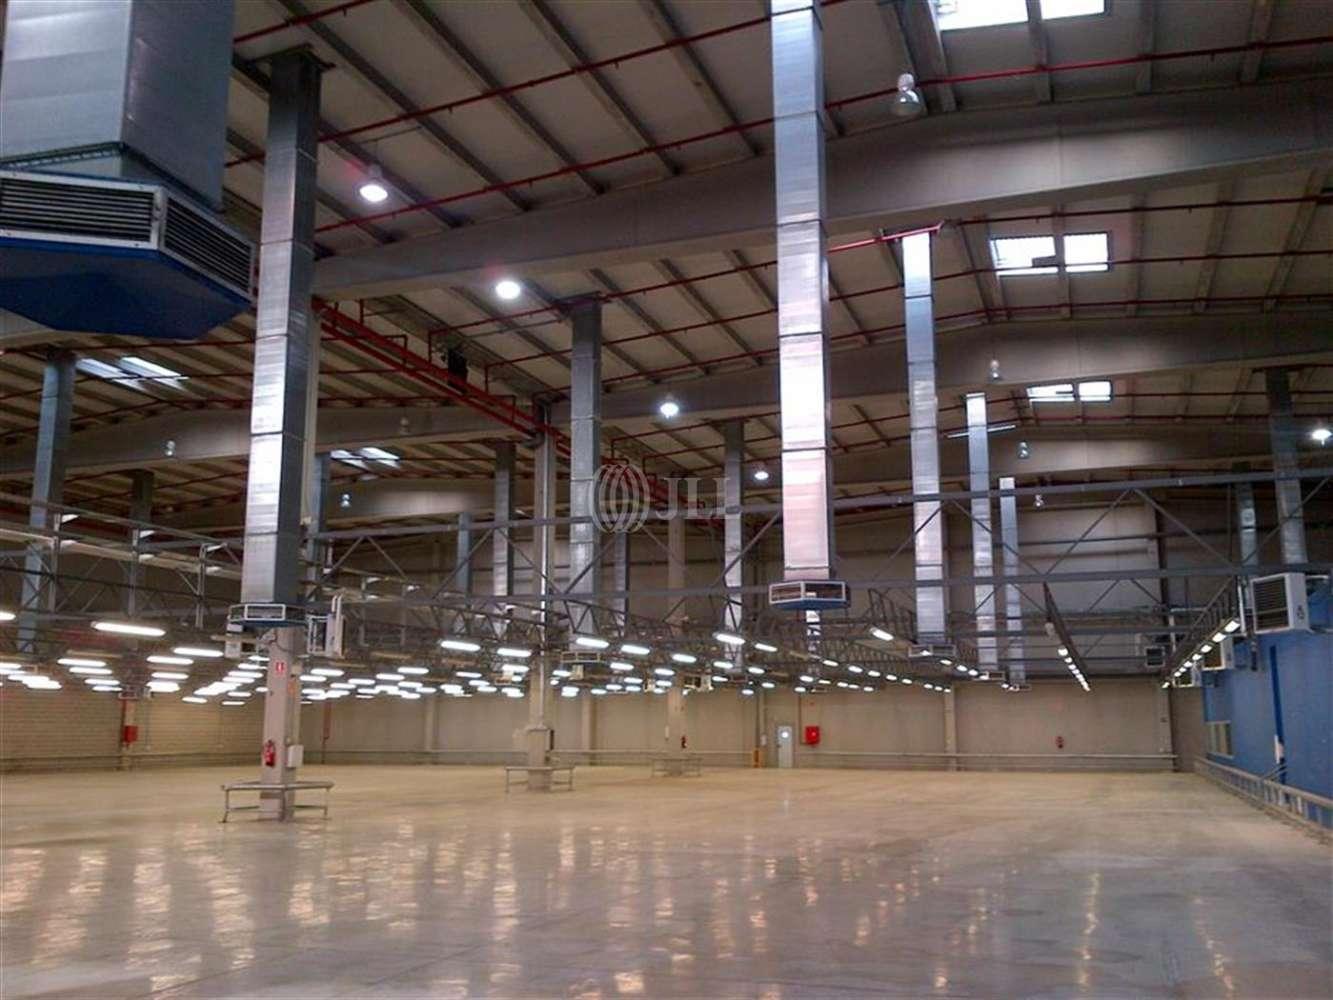 Naves industriales y logísticas Barcelona, 8040 - B0059 - PI PARC LOGISTIC ZONA FRANCA